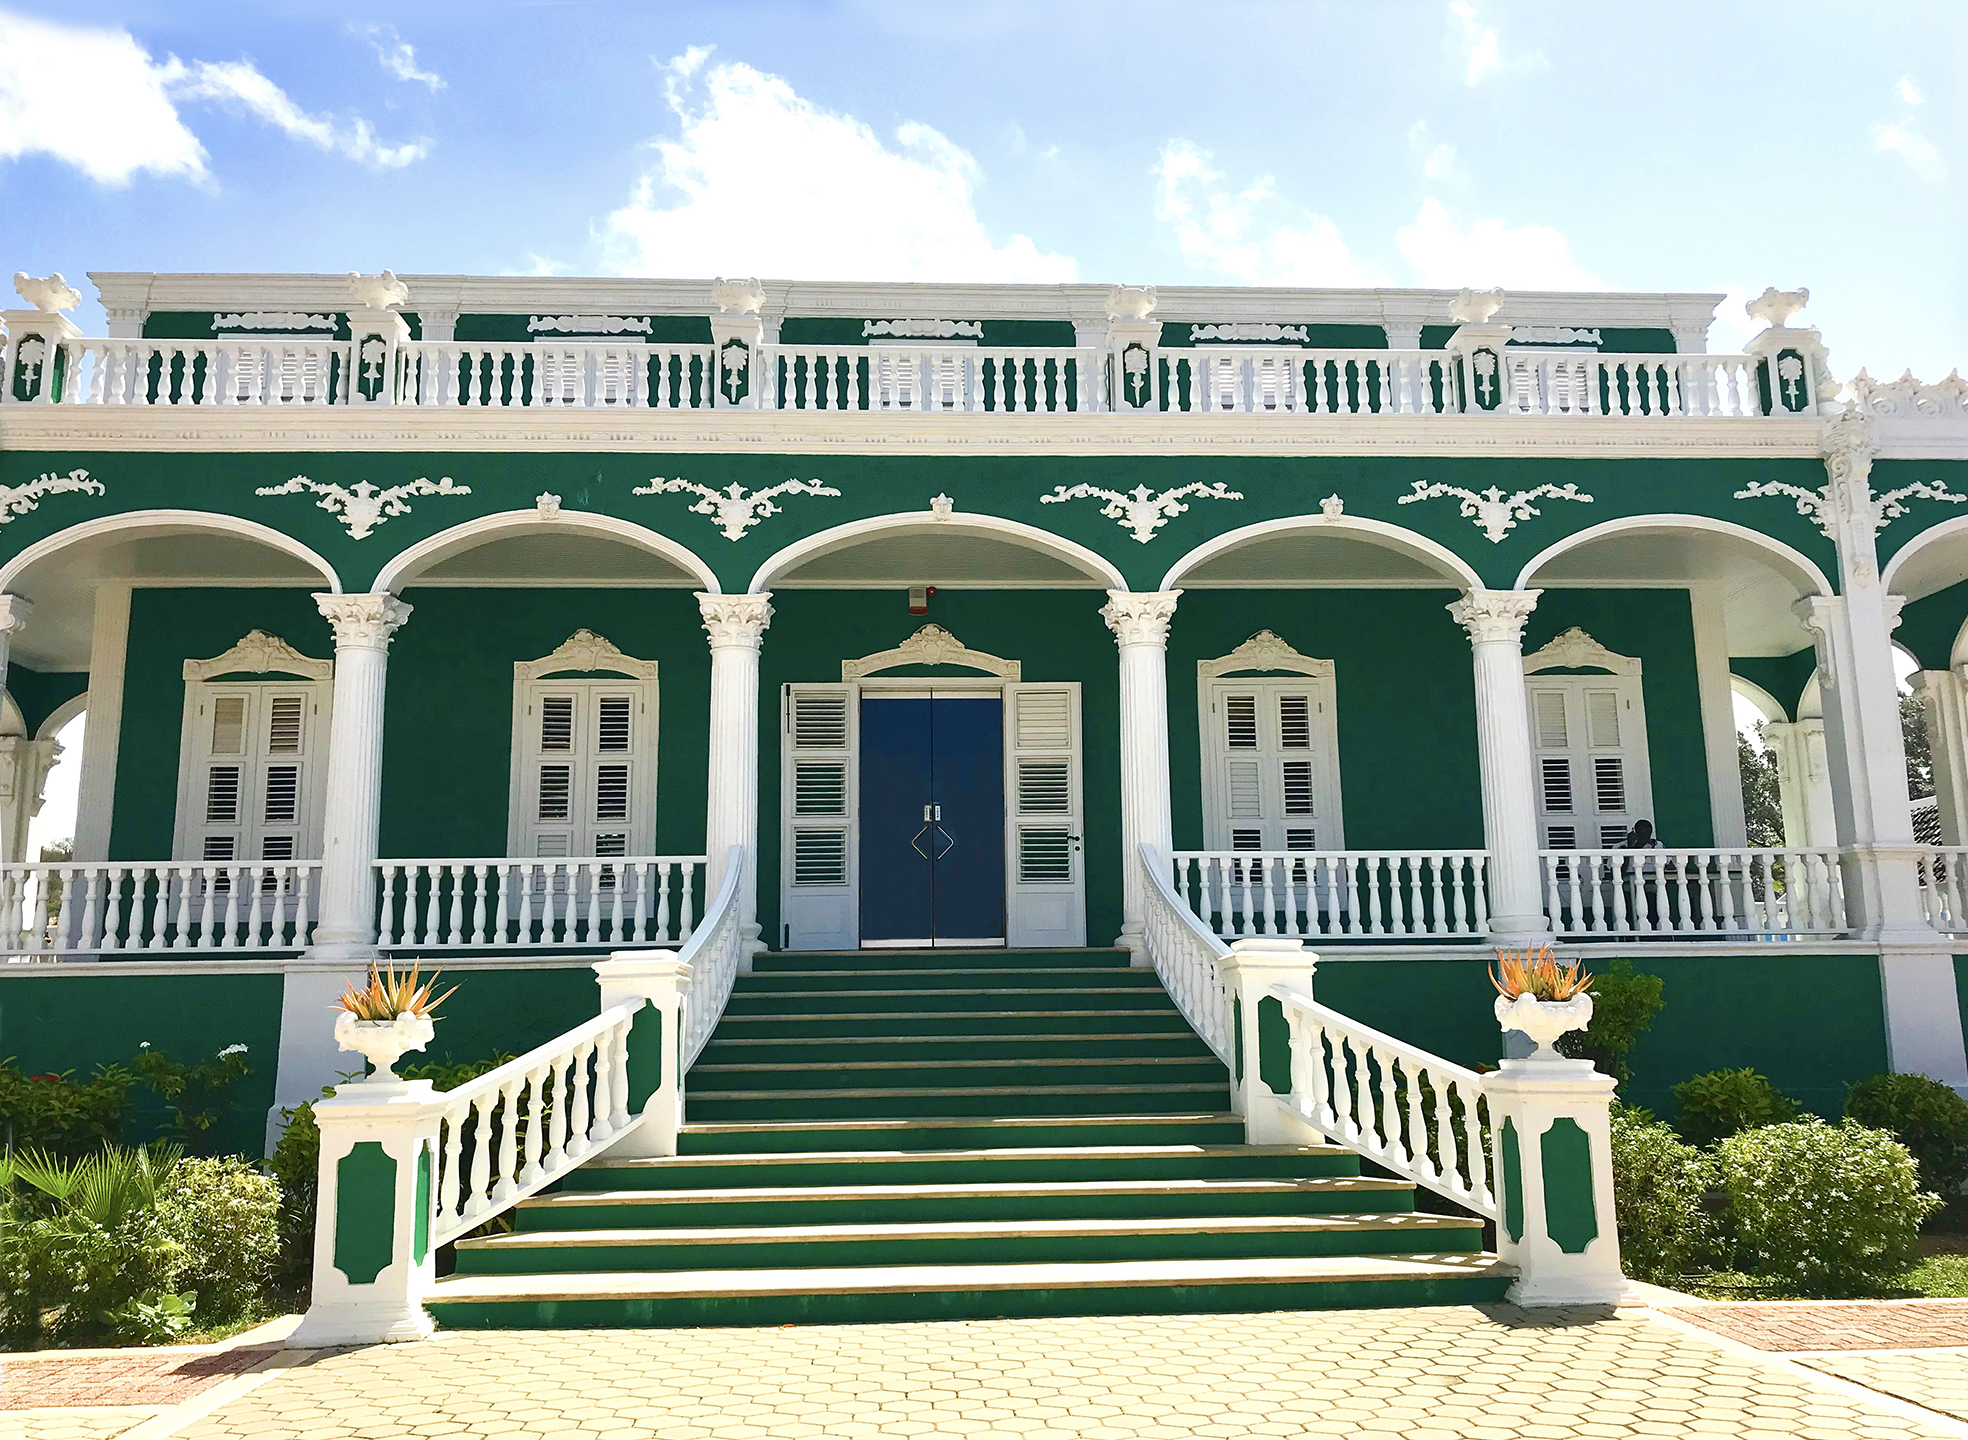 Curacao Wedding Cake House Copy Moment Magazine The Next 5 000